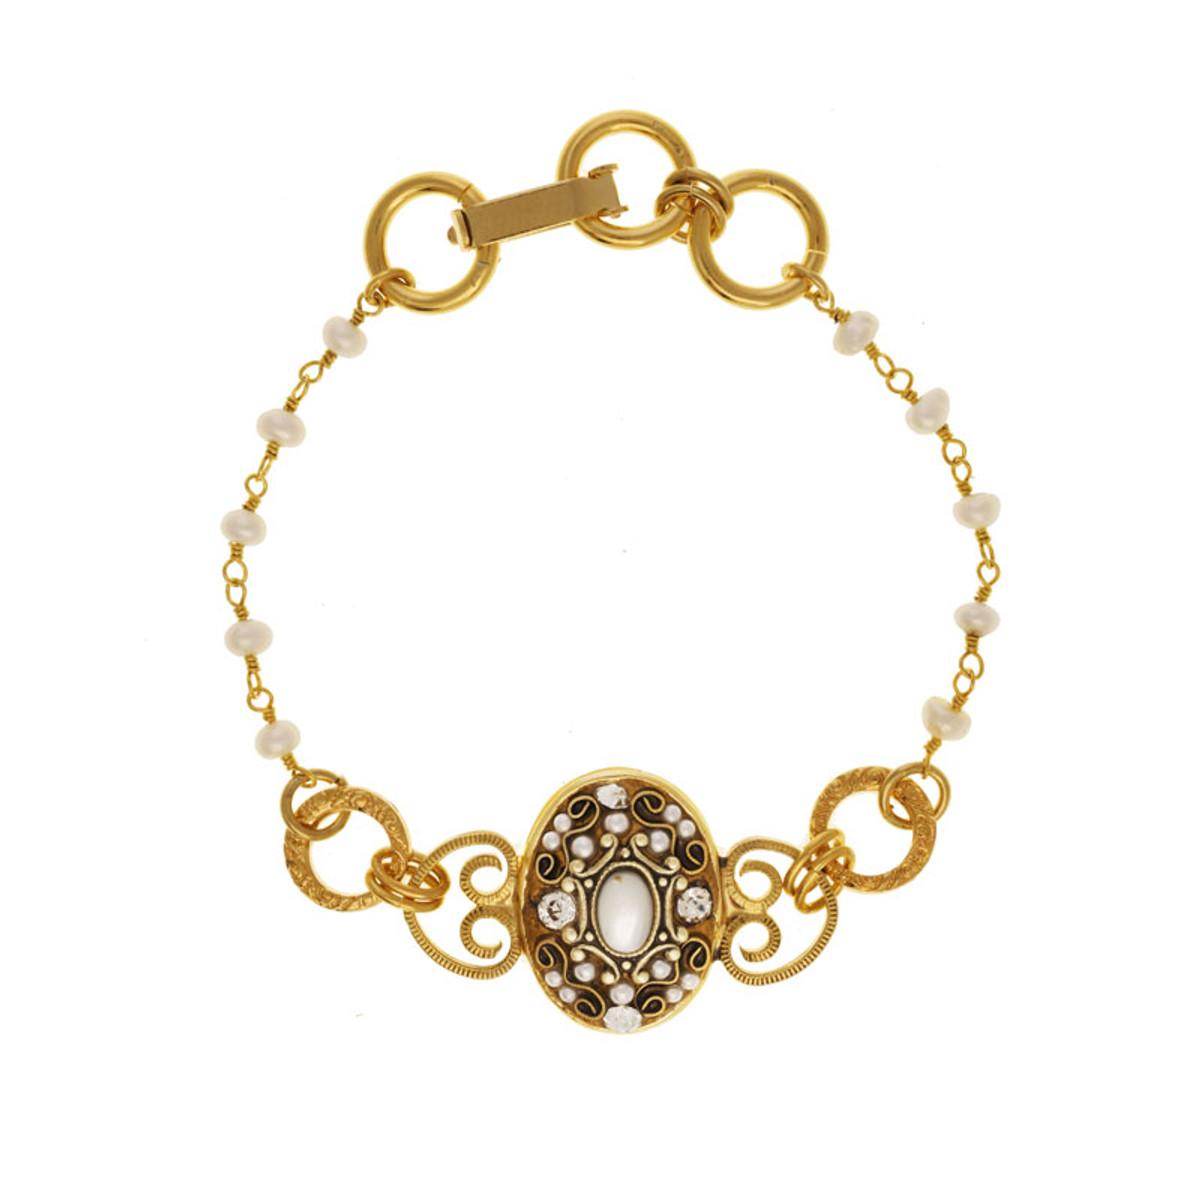 White Elegante style bracelet by Michal Golan Jewelry